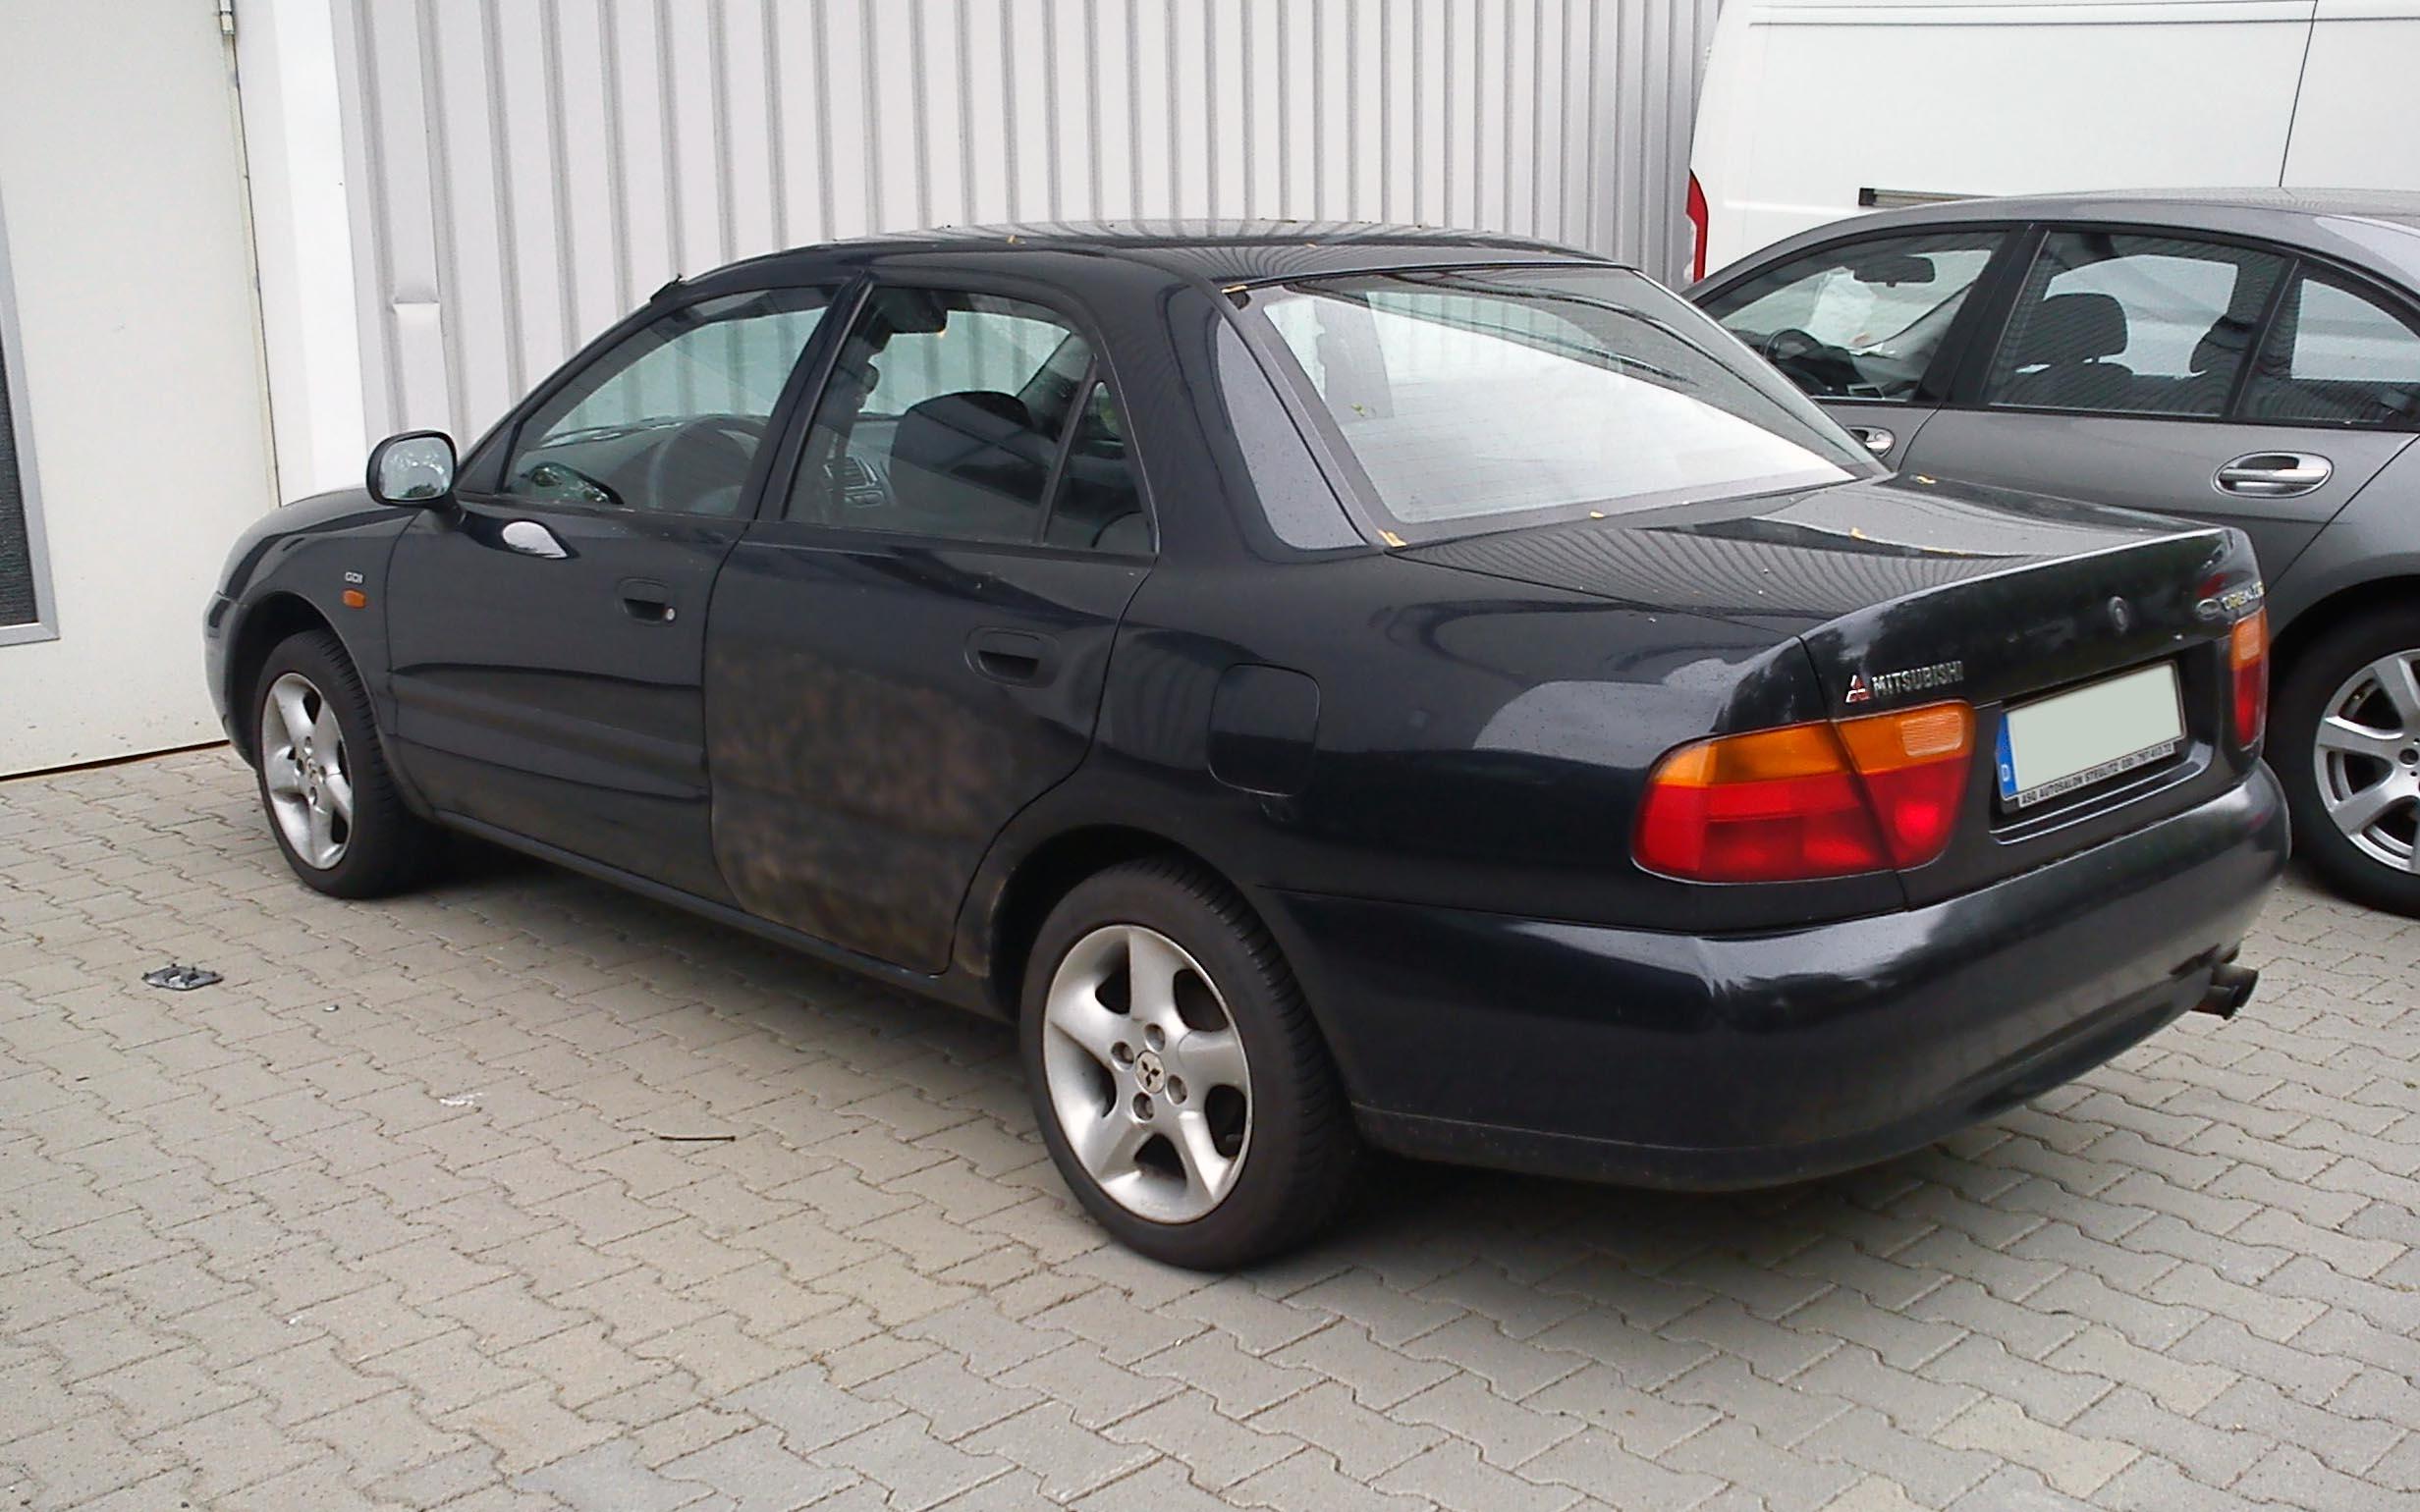 File:Black Mitsubishi Carisma sedan.jpg - Wikimedia Commons